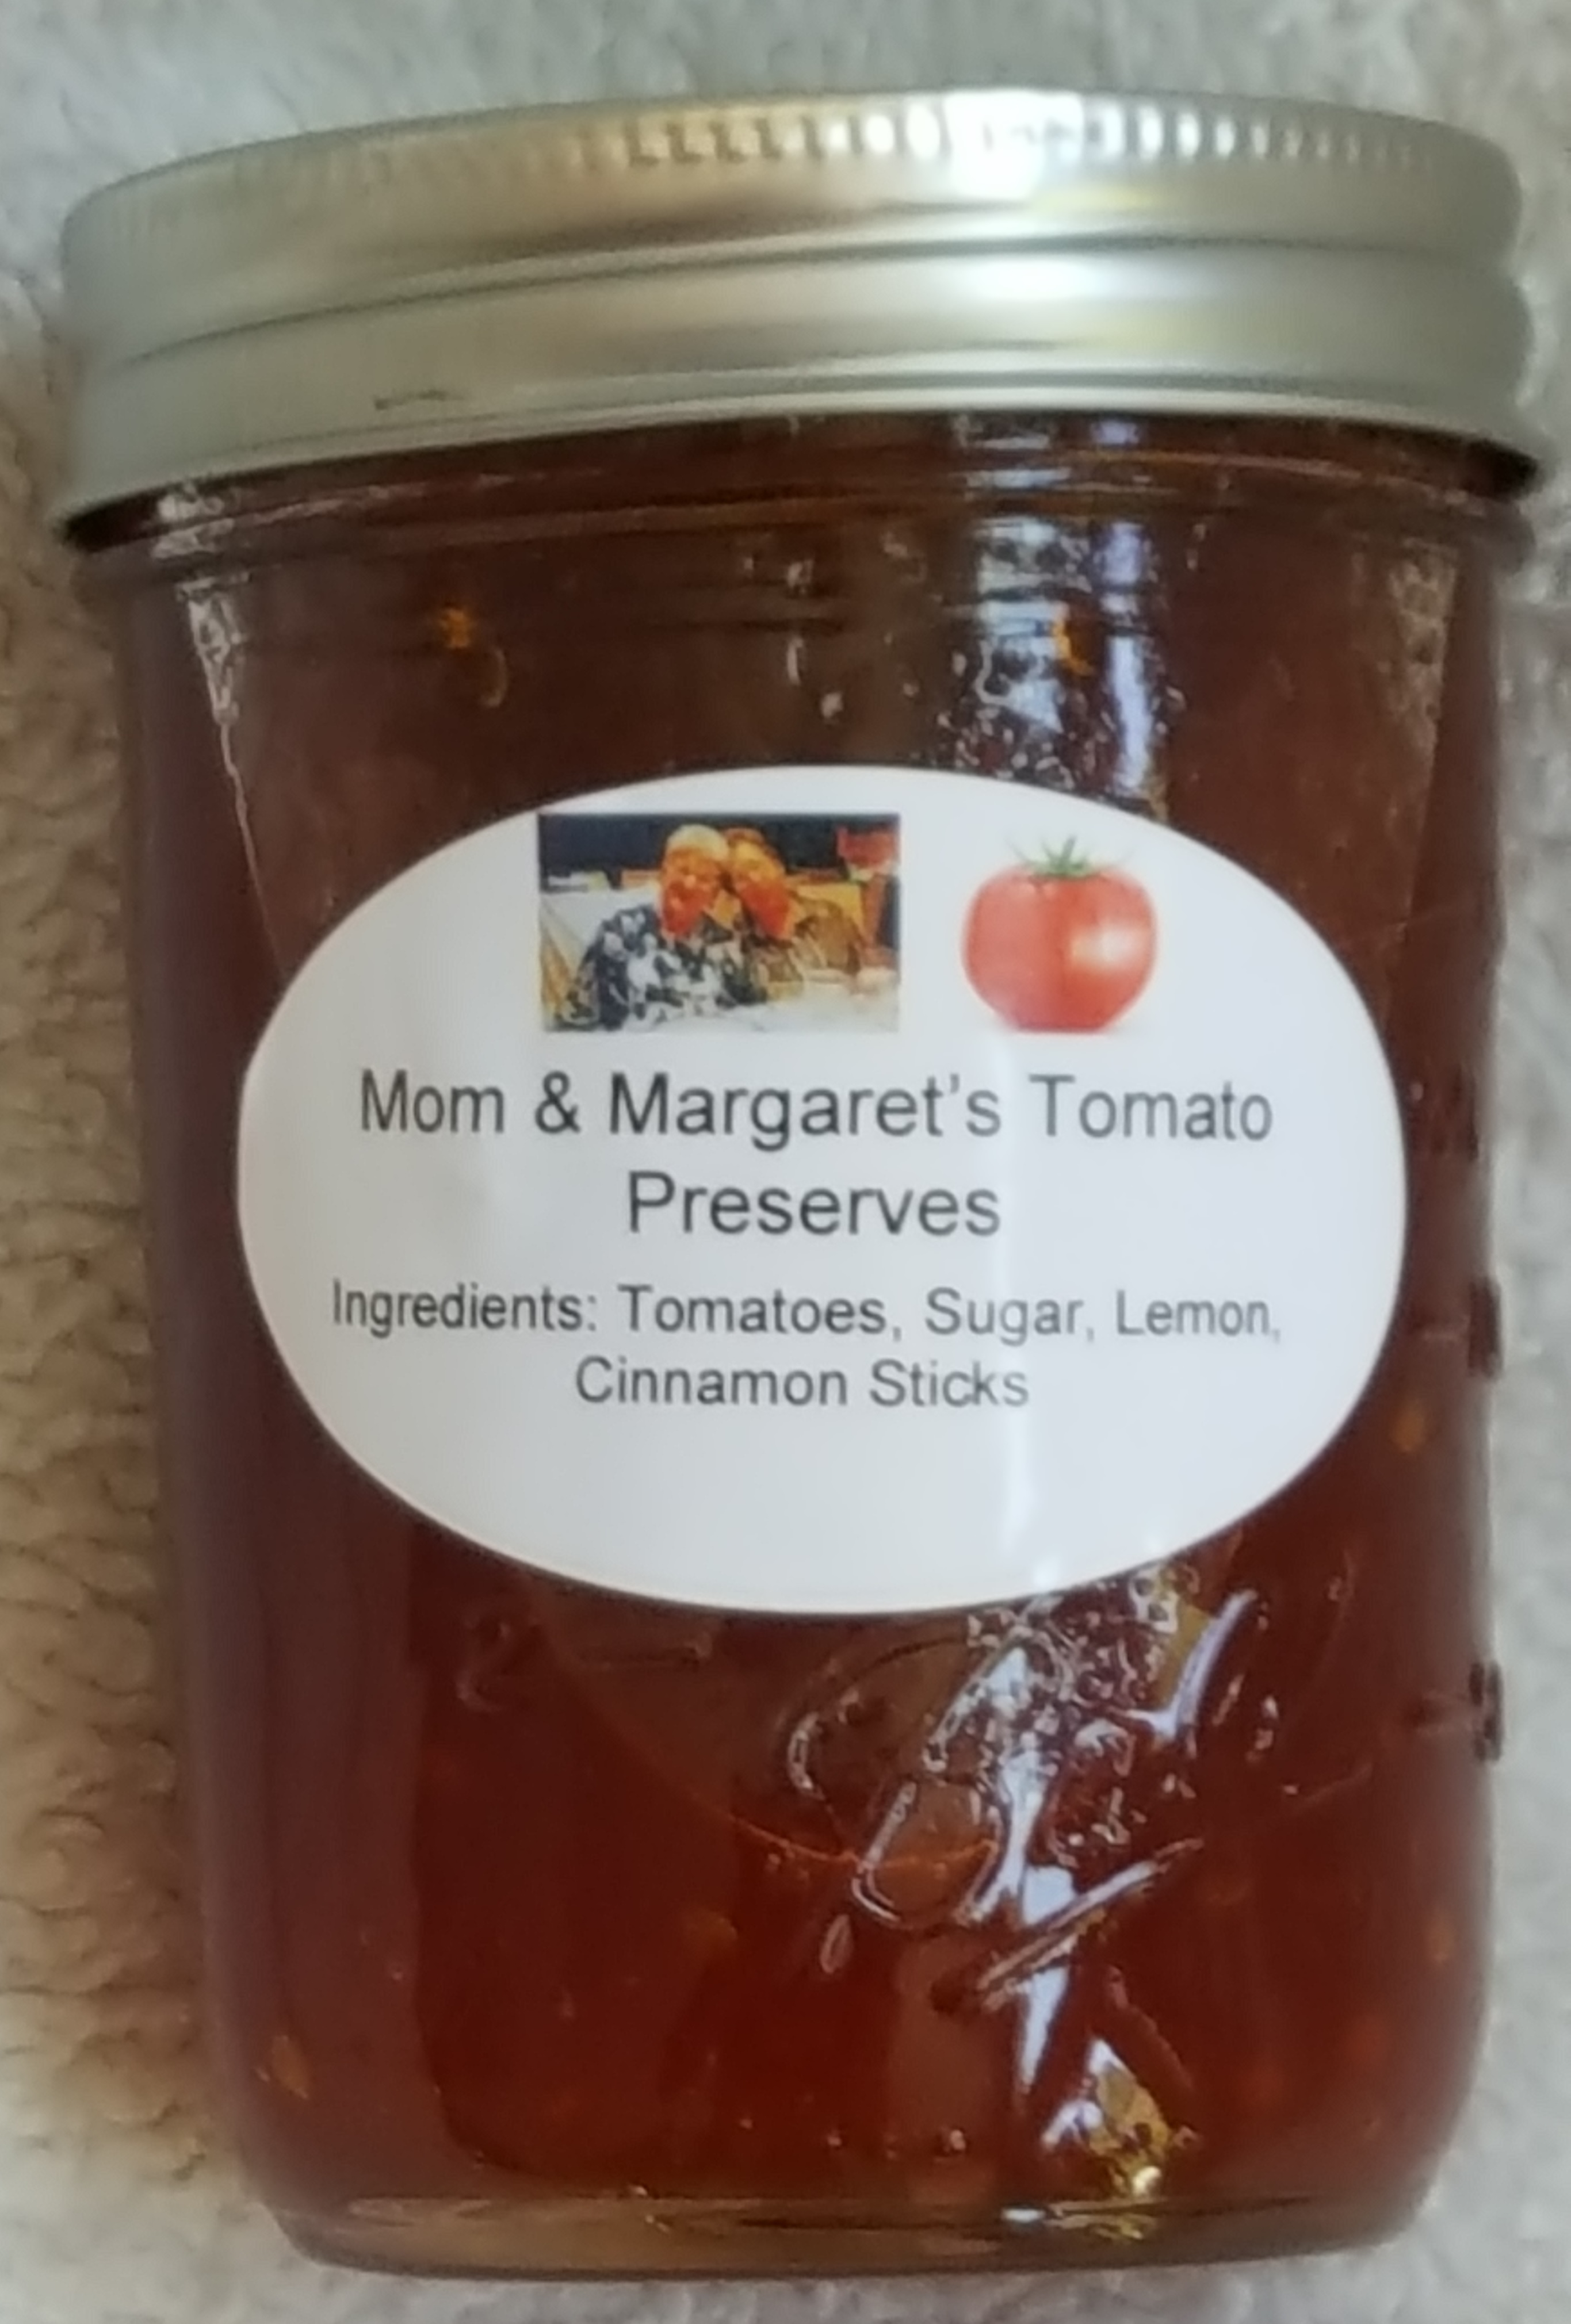 Mom & Margaret's Tomato Preserves | Turtle Creek at Lake ...